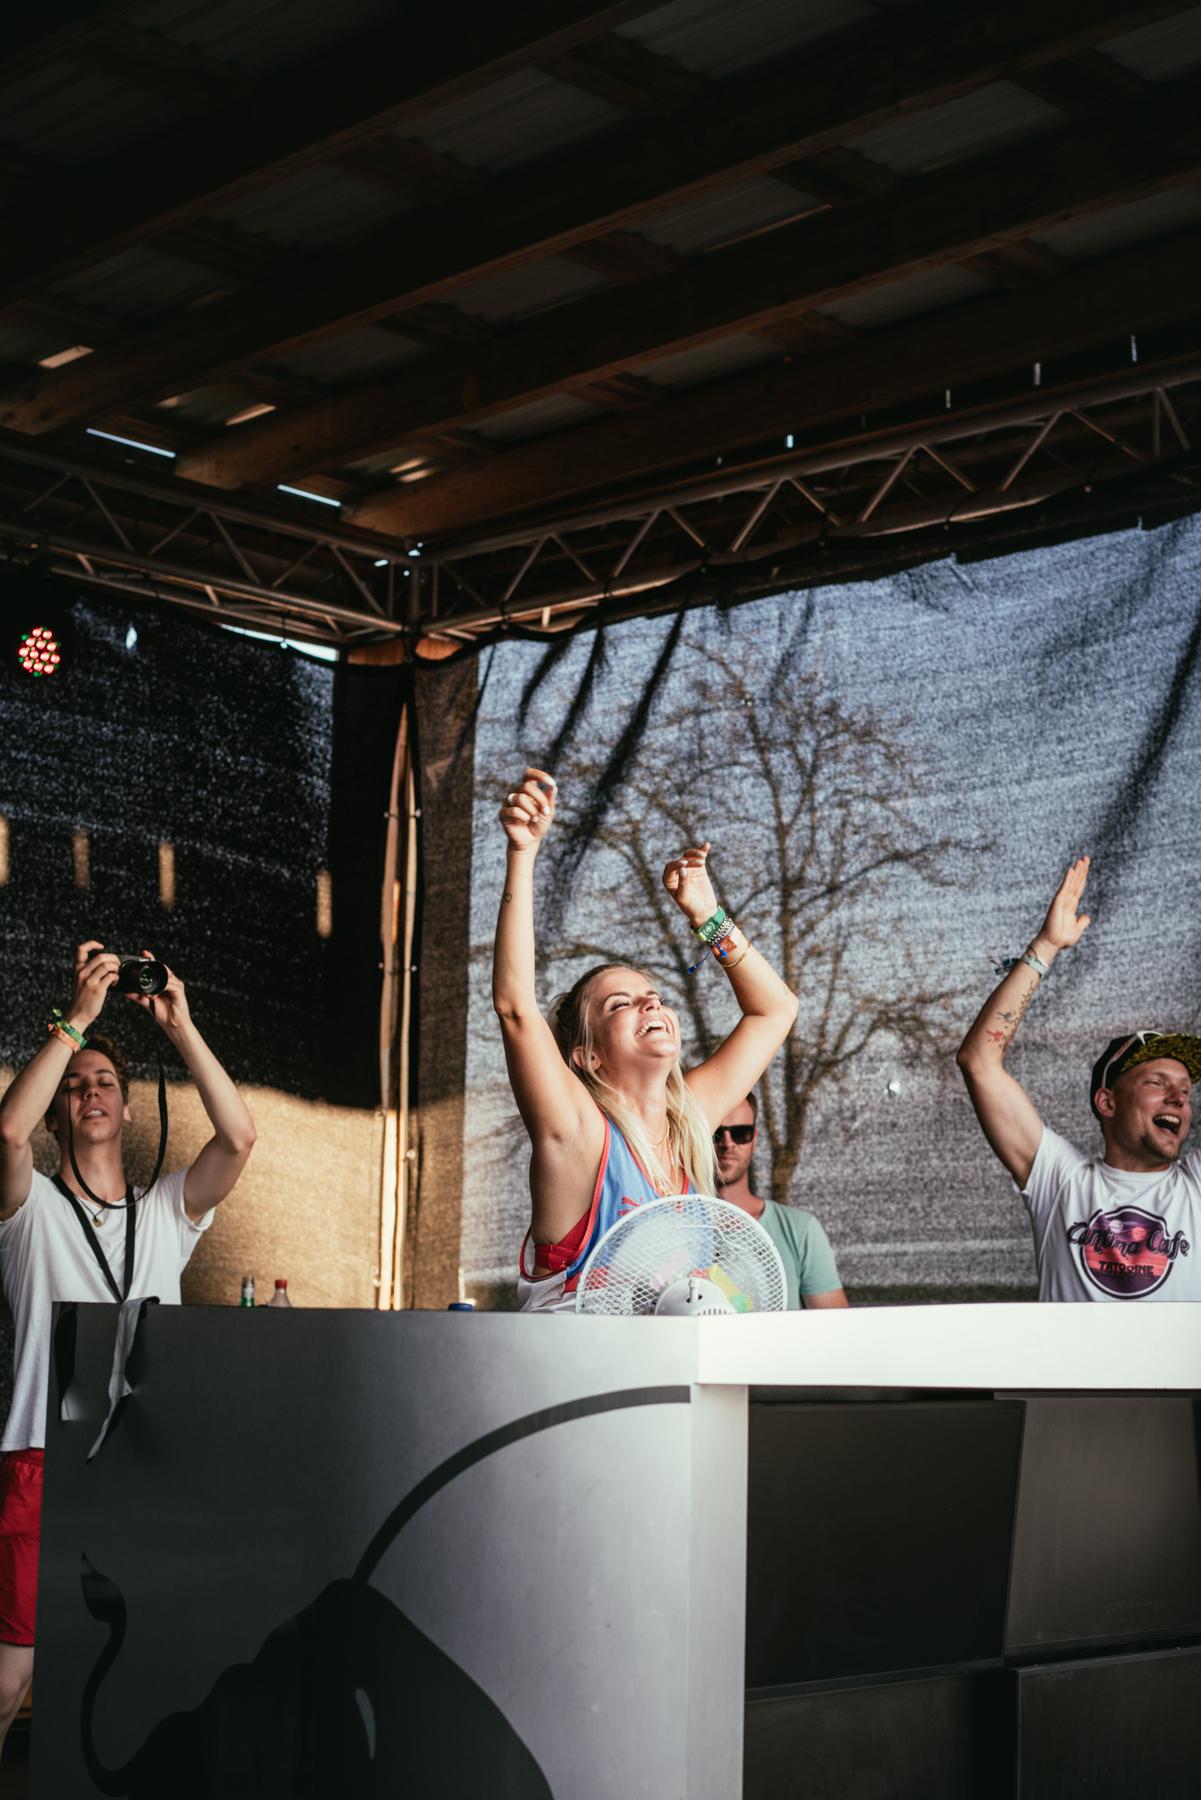 28-07-2018 Helene Beach Festival_Impressions-34 Kopie